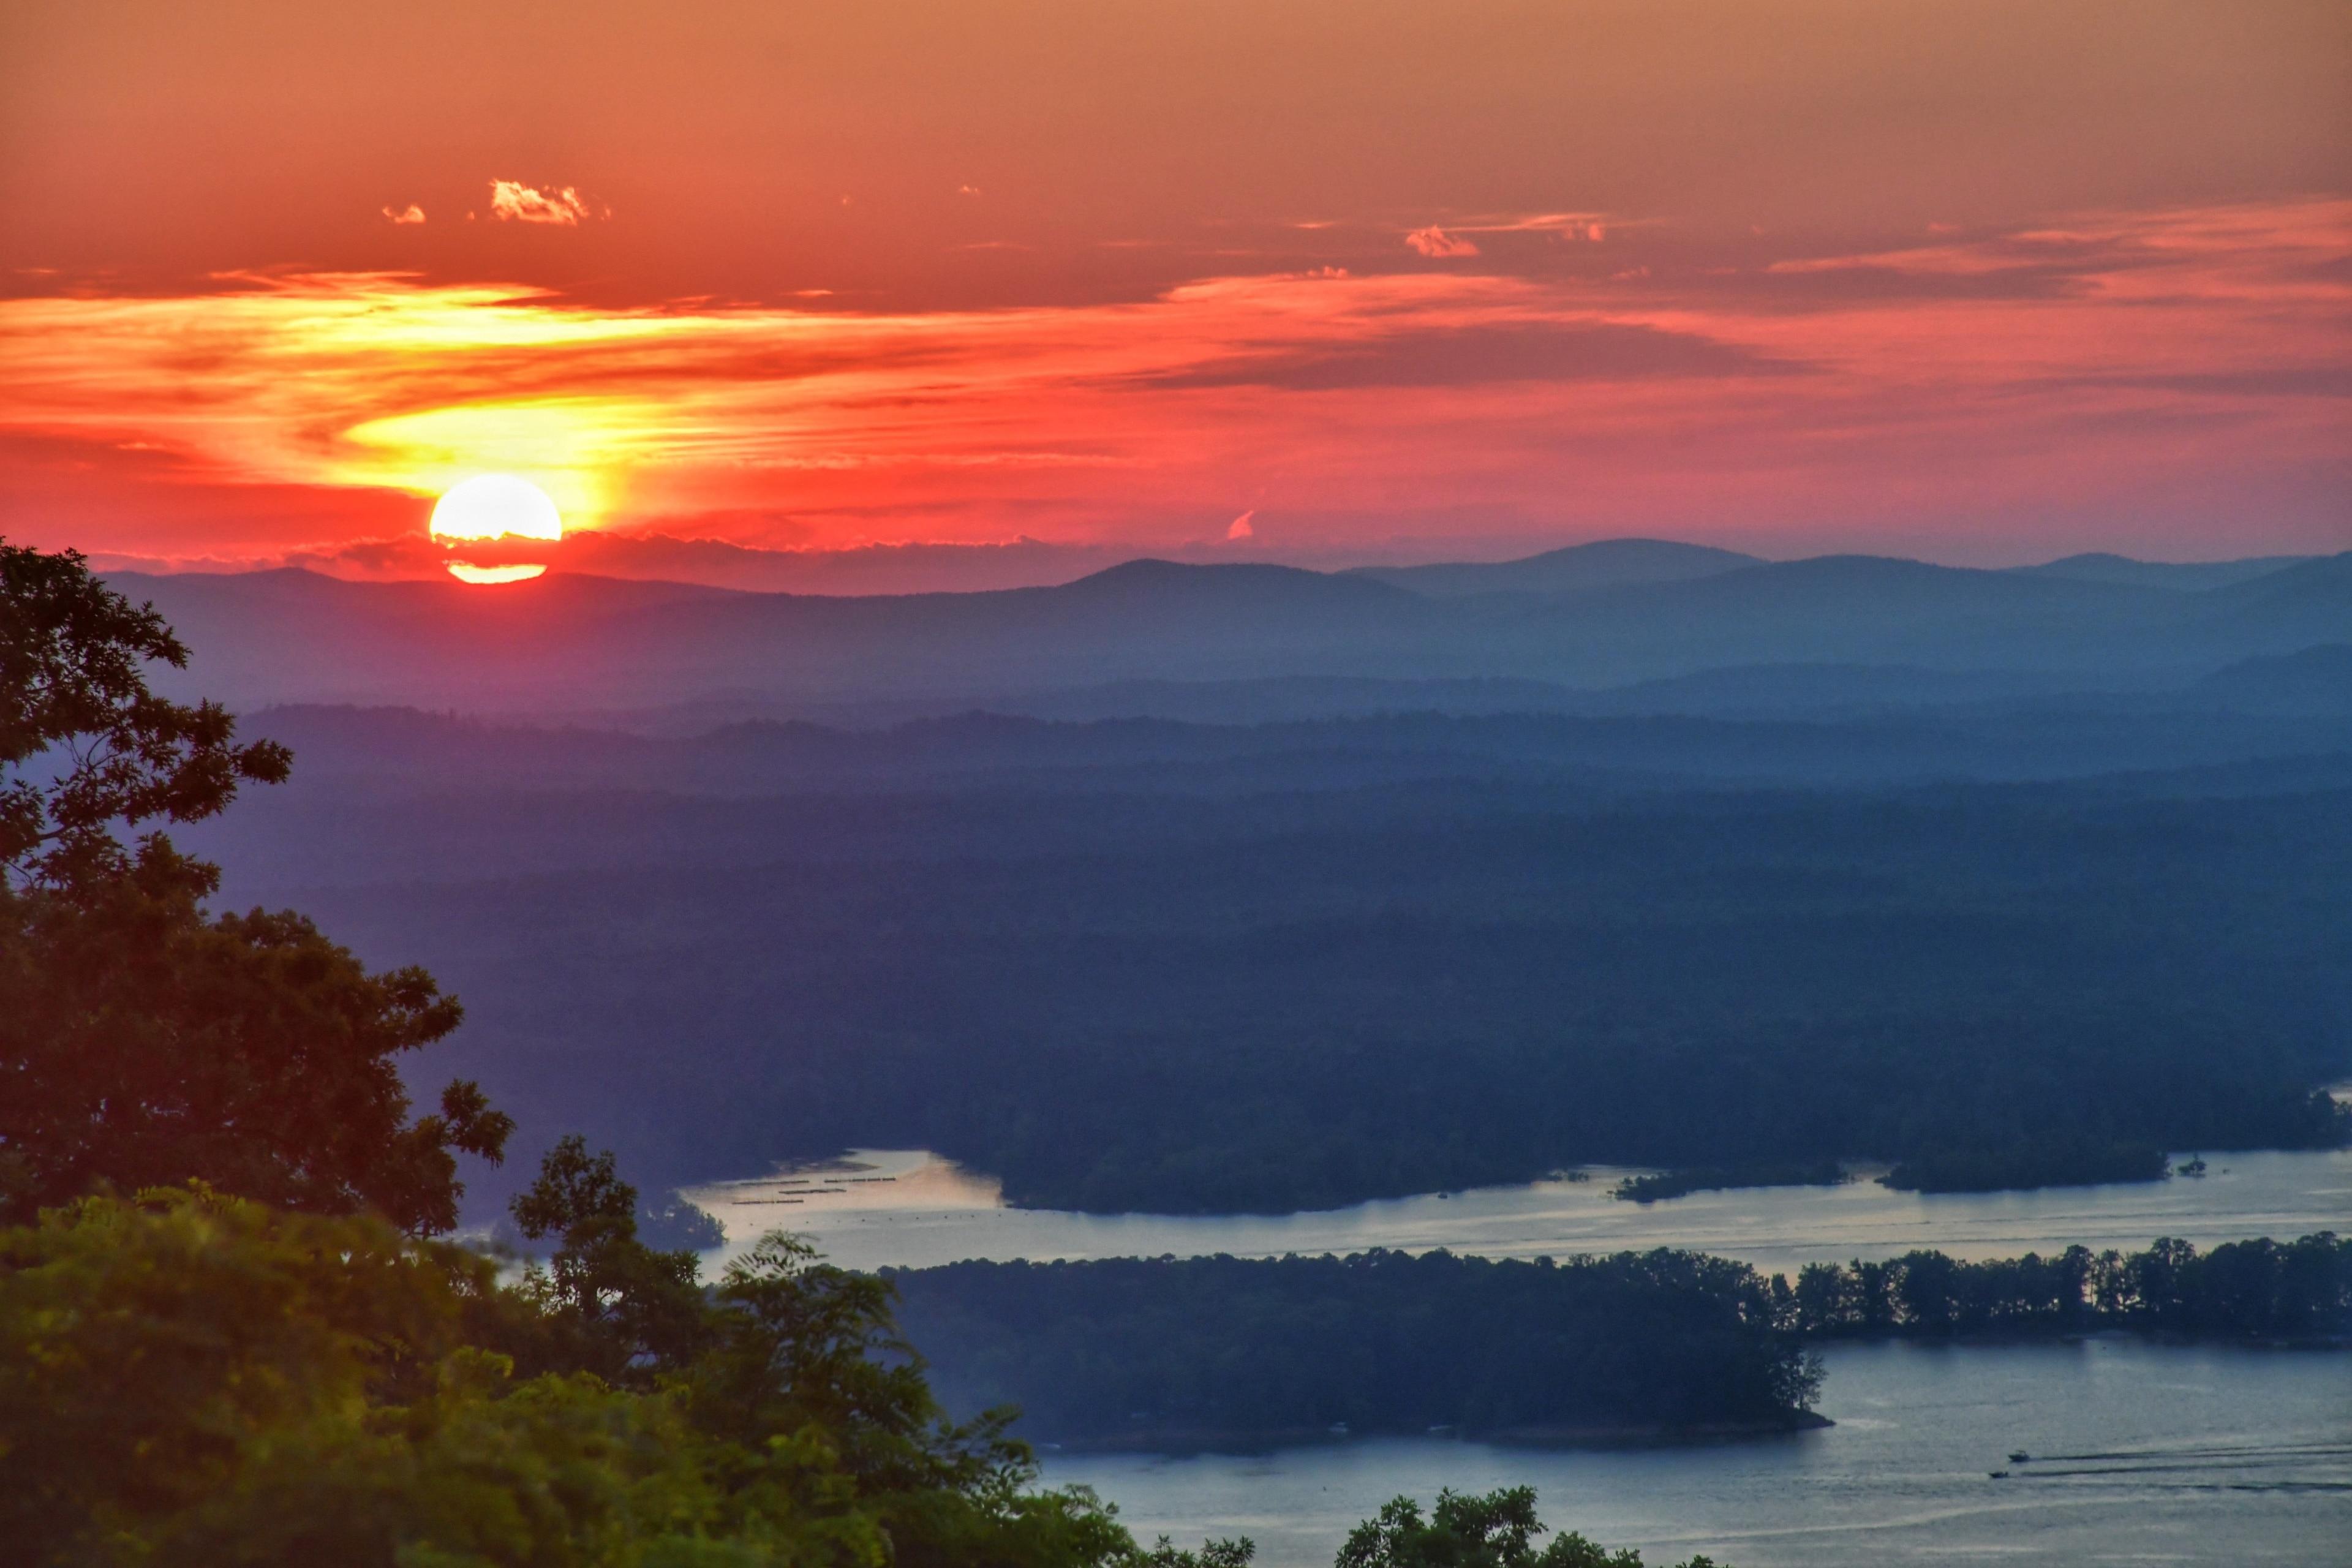 Lake Ouachita, Jessieville, Arkansas, United States of America